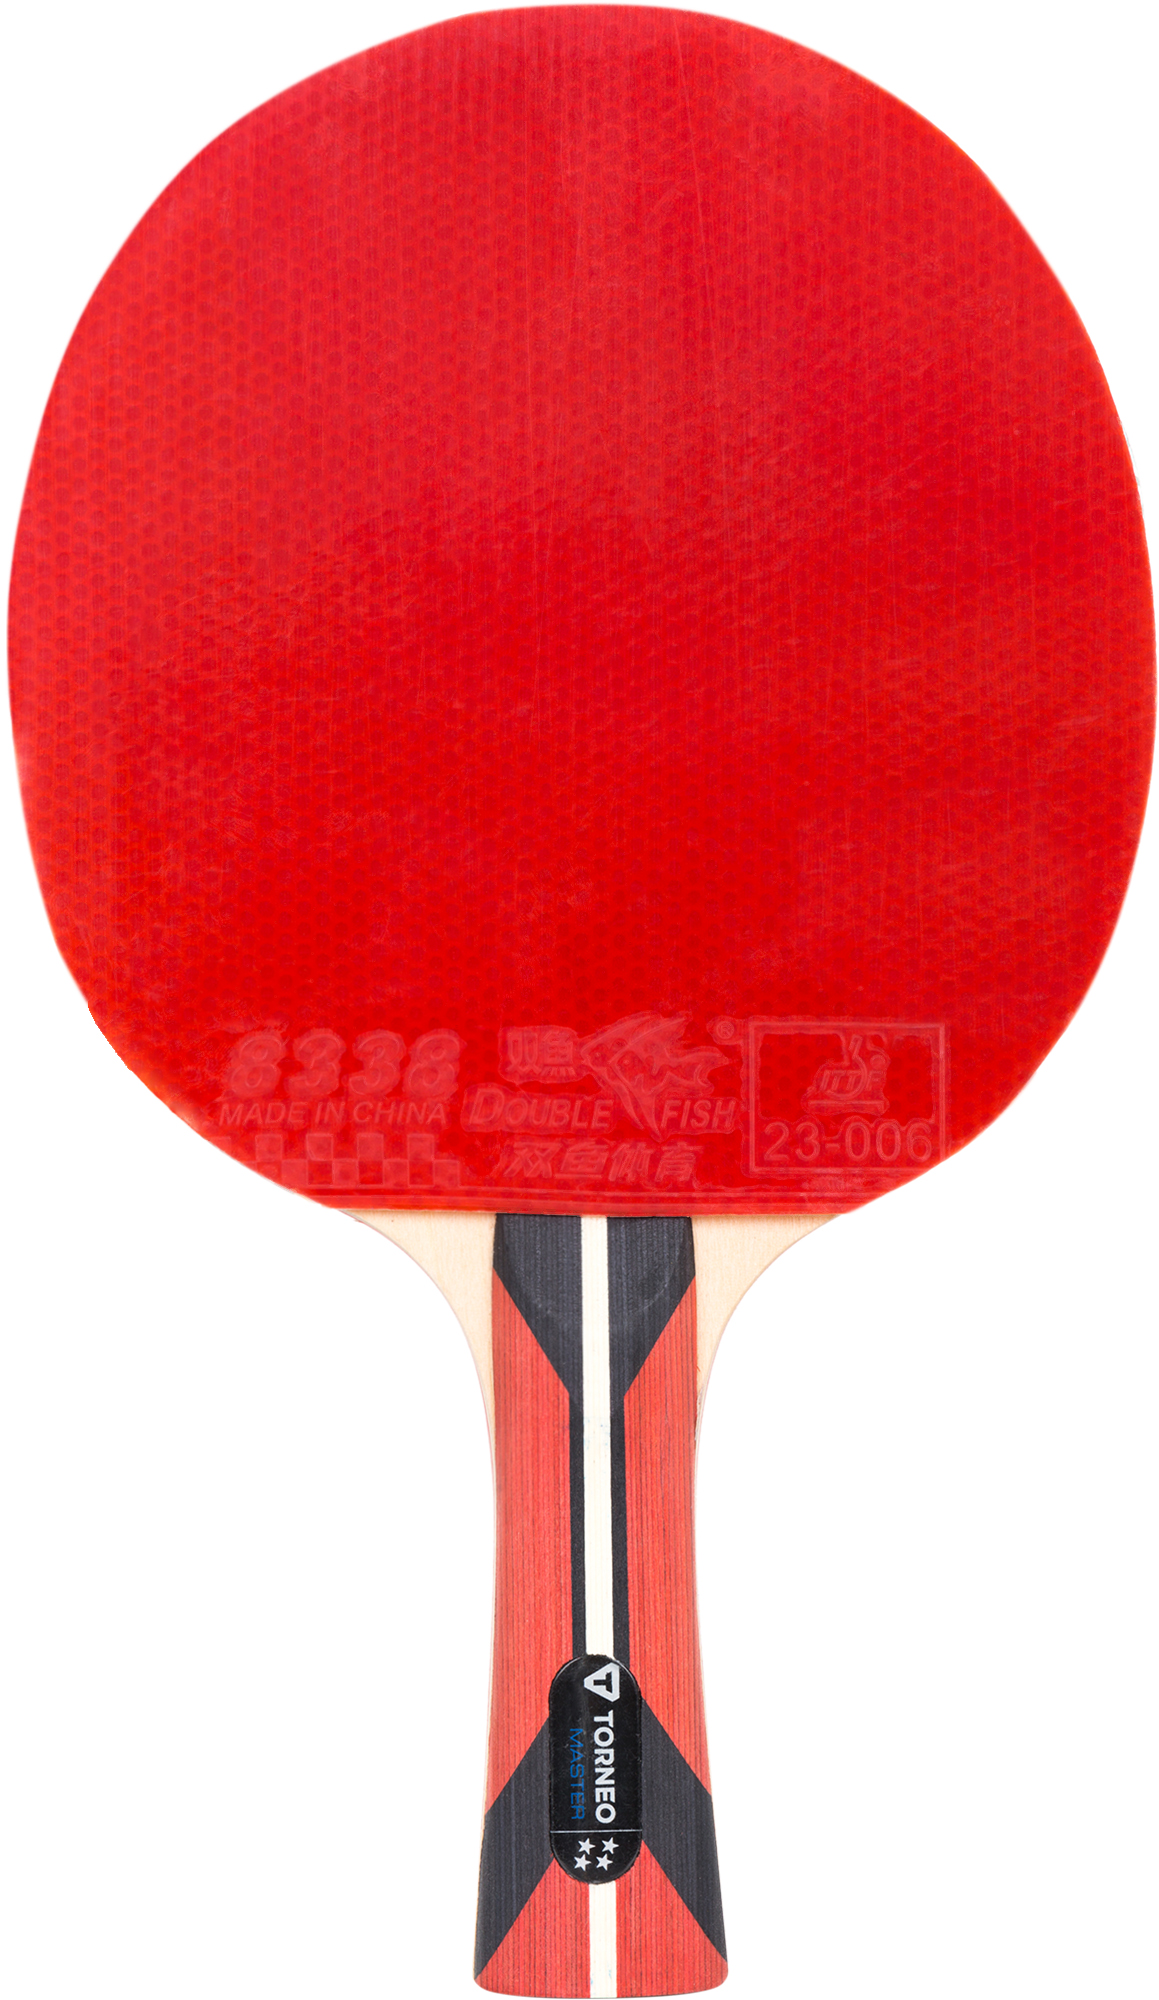 Torneo Ракетка для настольного тенниса Torneo Master torneo ракетка для настольного тенниса torneo training